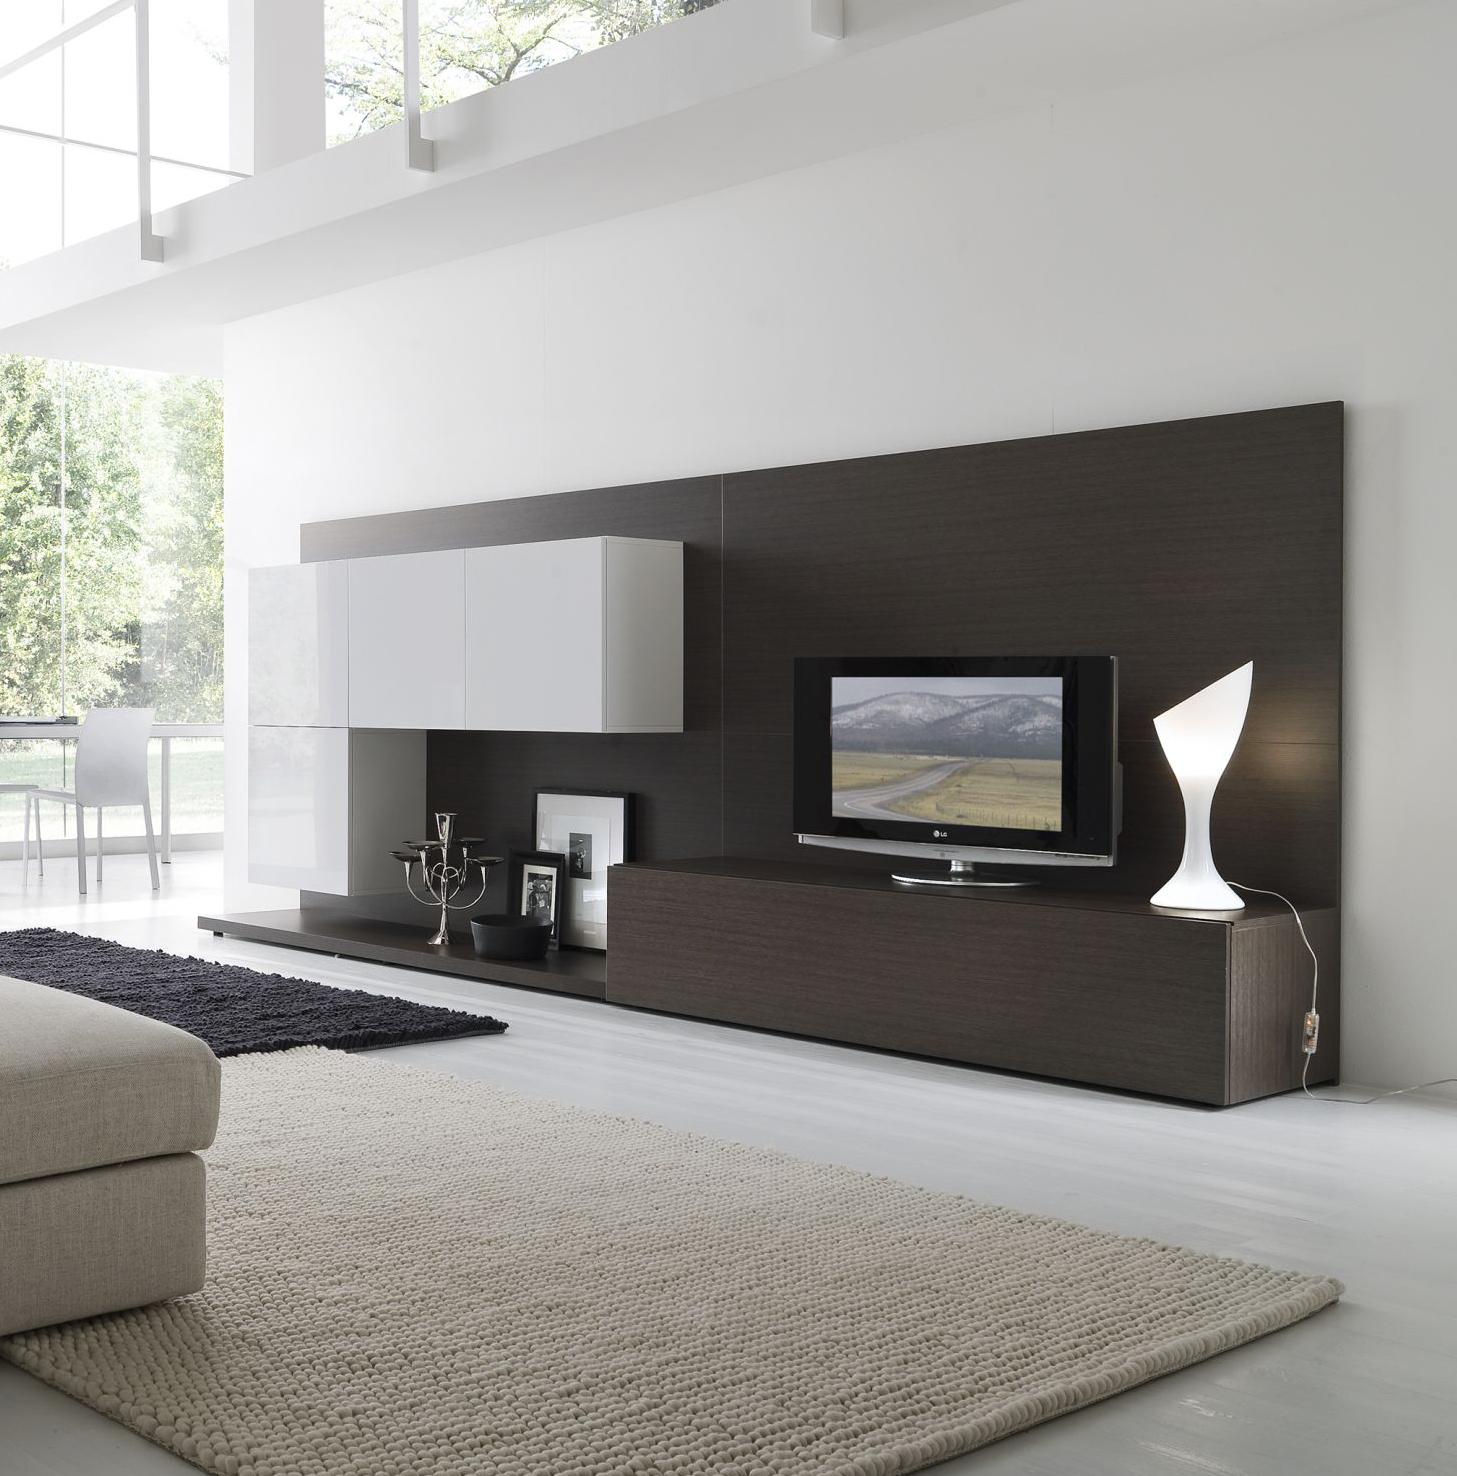 http://1.bp.blogspot.com/-rChRlwlJLPE/T7-gvyrM6bI/AAAAAAAAAjs/yyfLZ9sYWY8/s1600/Minimalistic-Living-Room-Interior.jpg